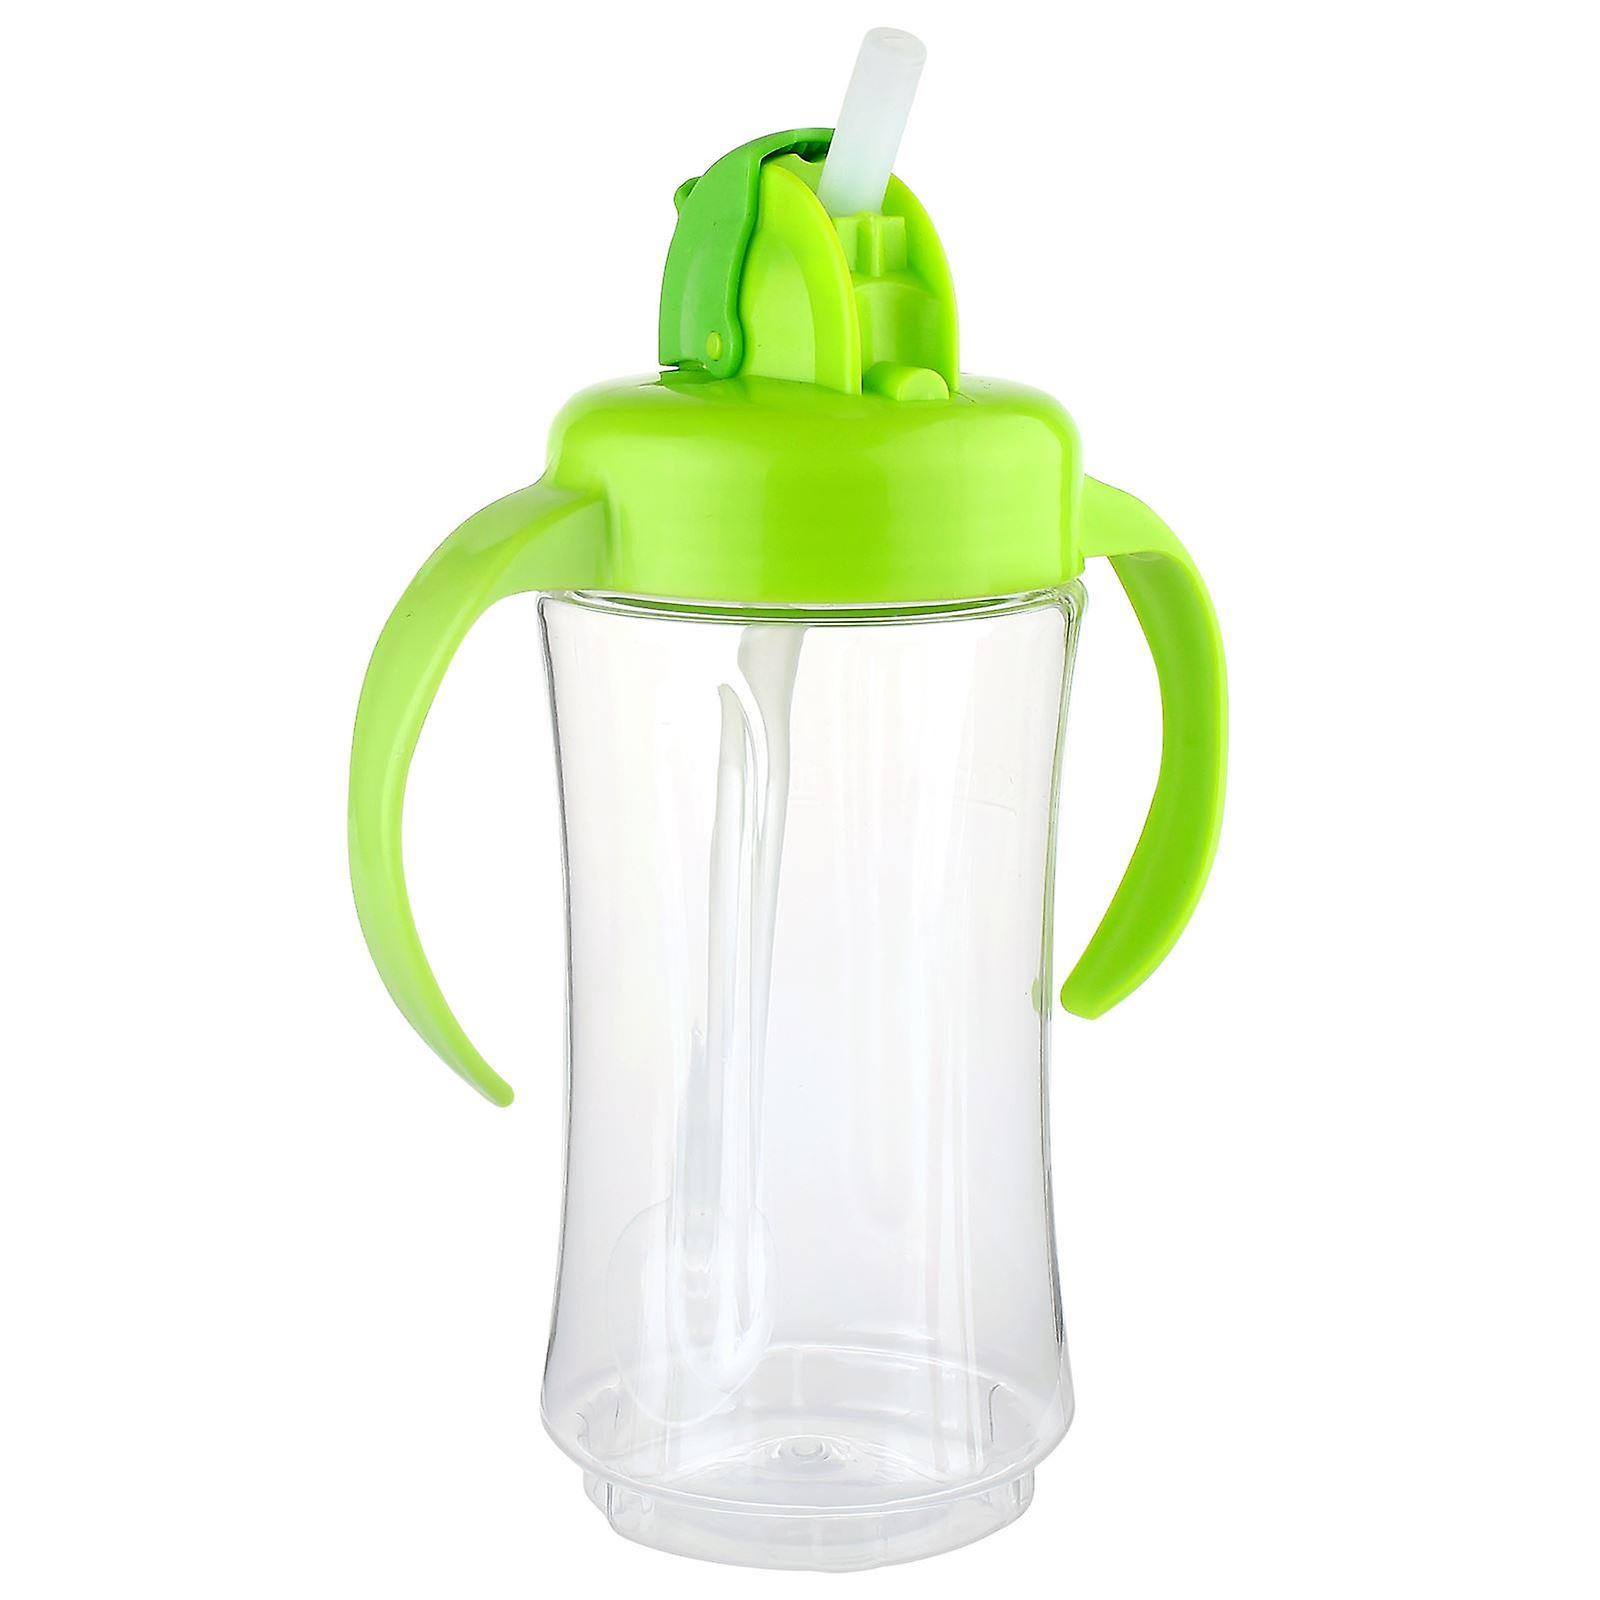 AMOS Juice Master Children's Bottle